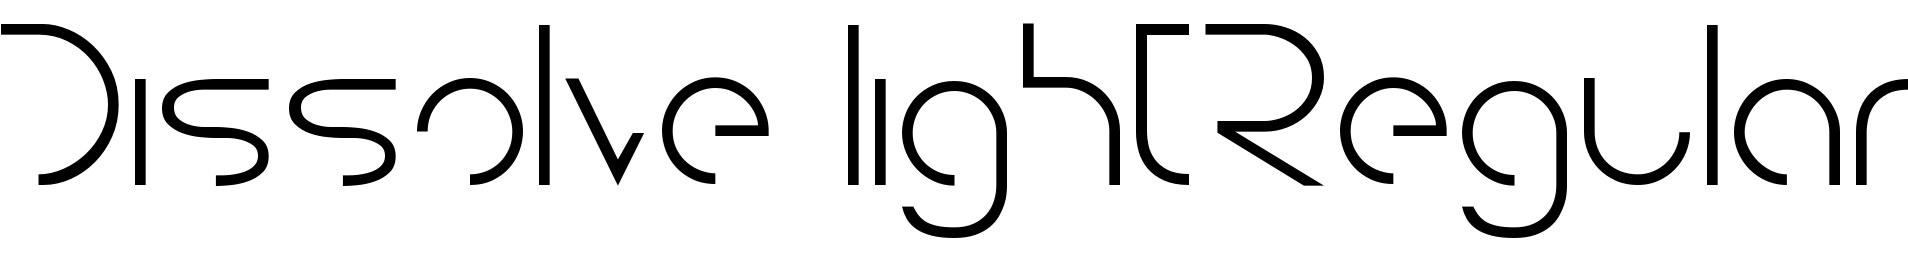 Dissolve lightRegular